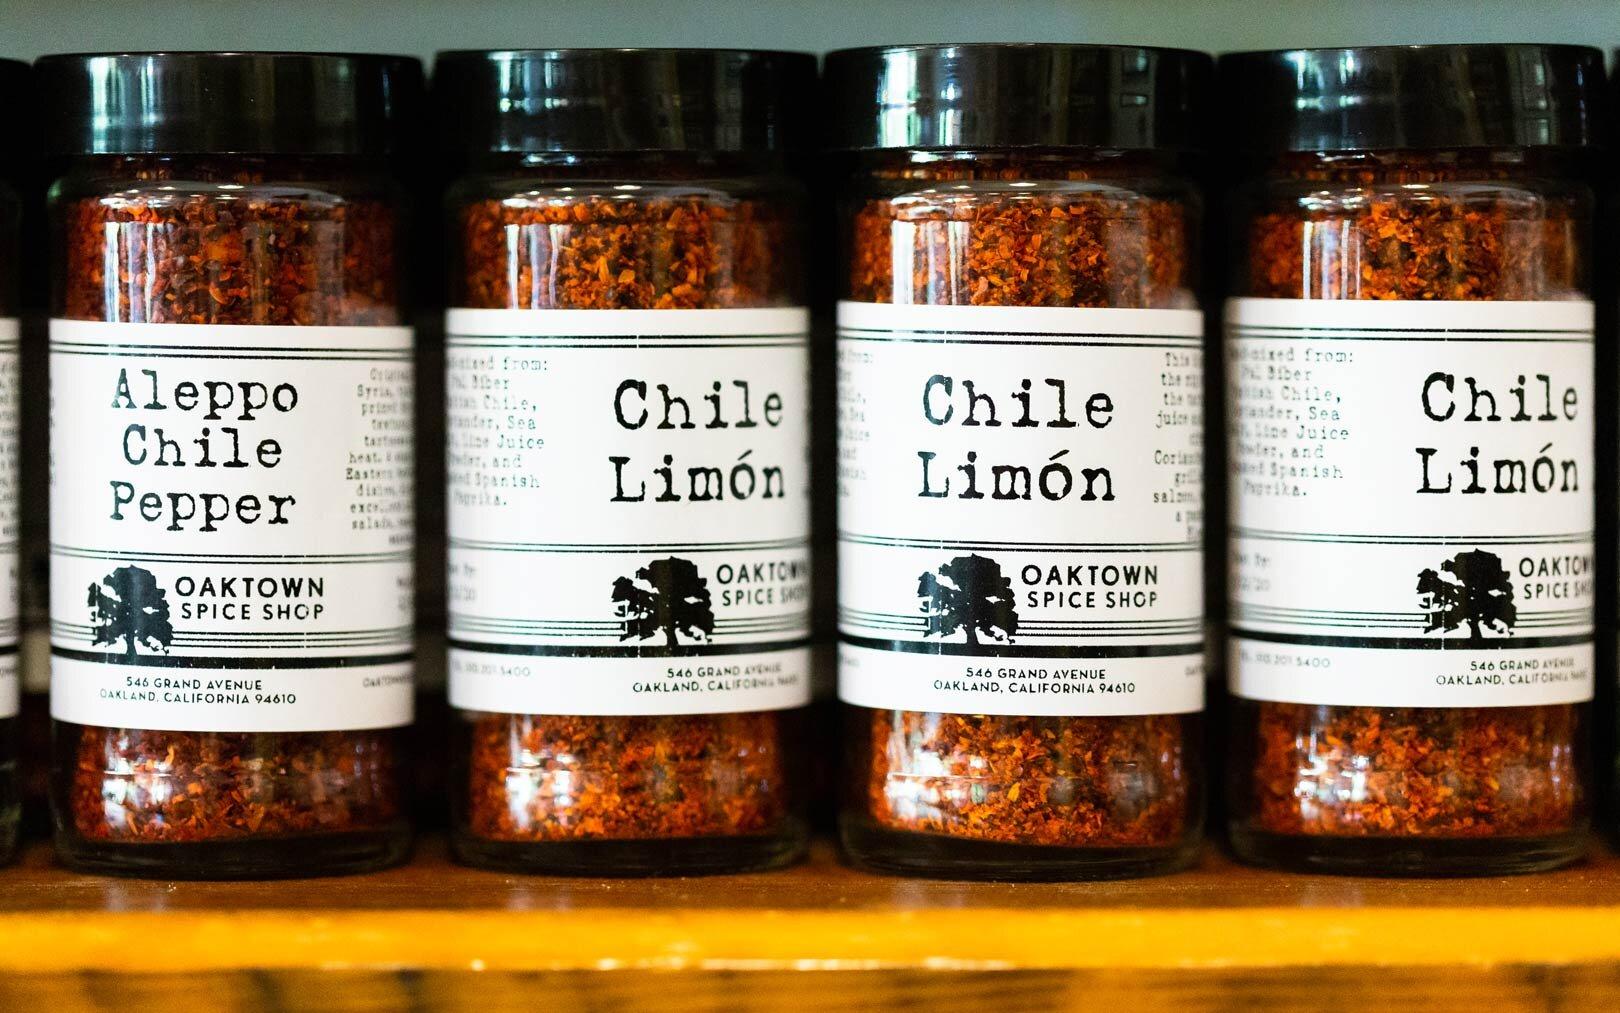 oaktown-spice-shop-chiles.jpg